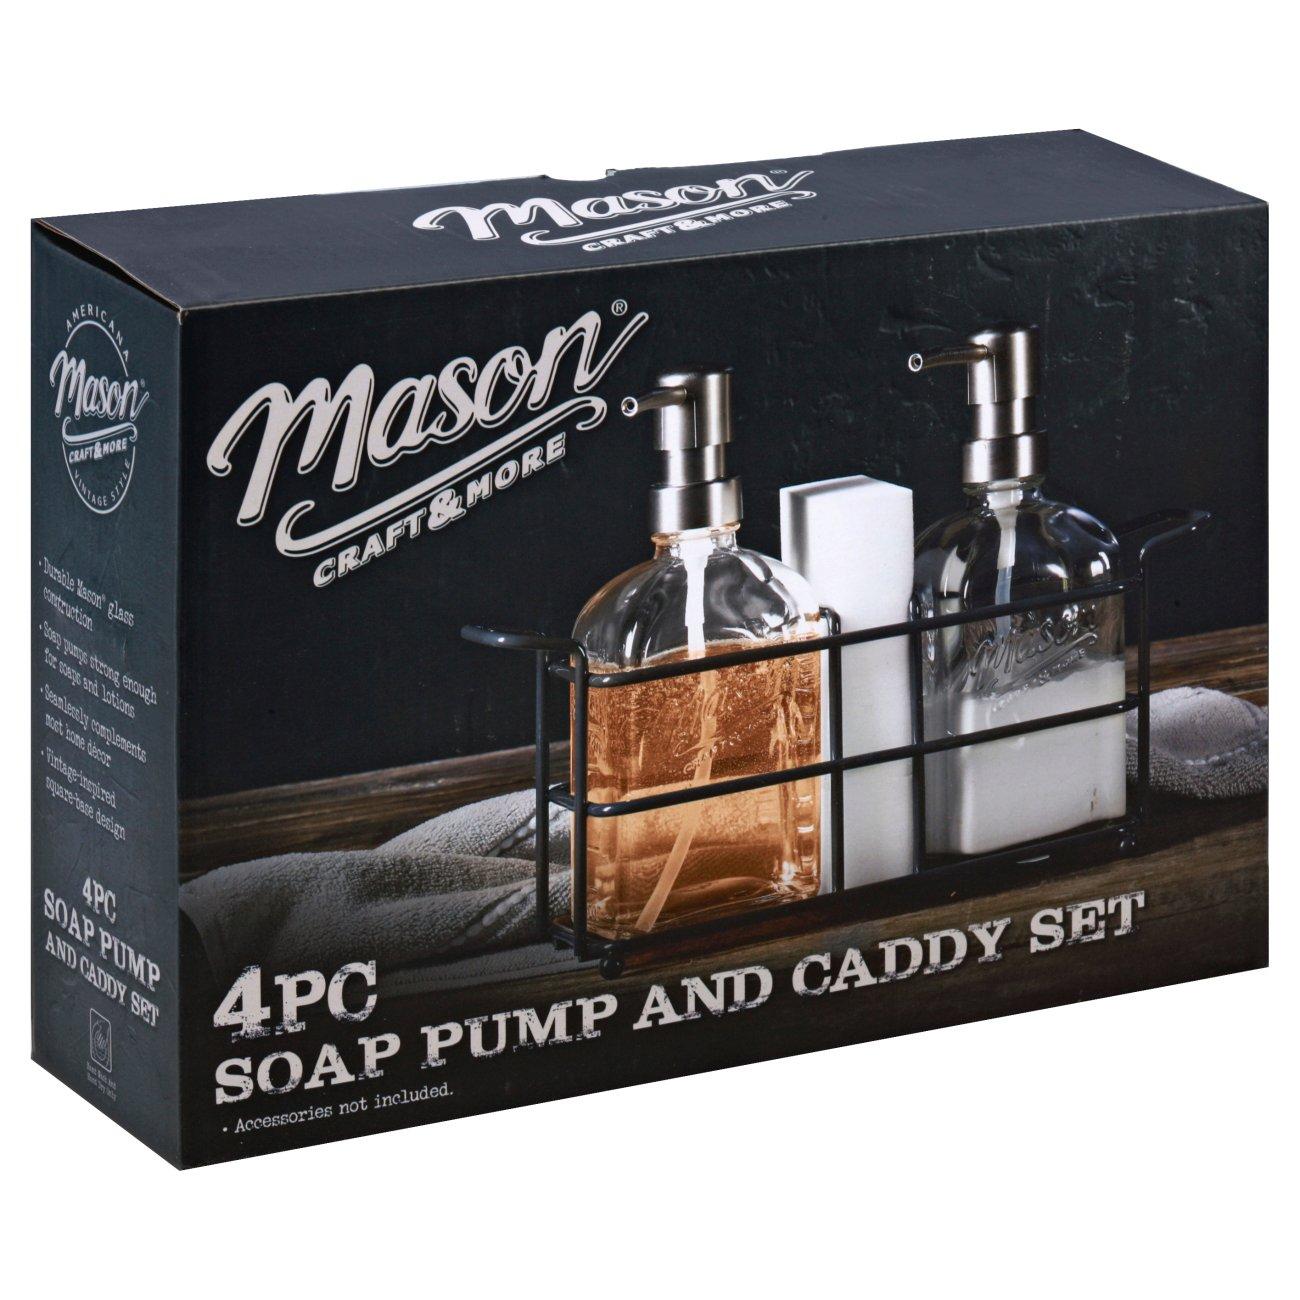 Mason Craft More Soap Dispenser Set Shop Sink Kitchen Organizers At H E B